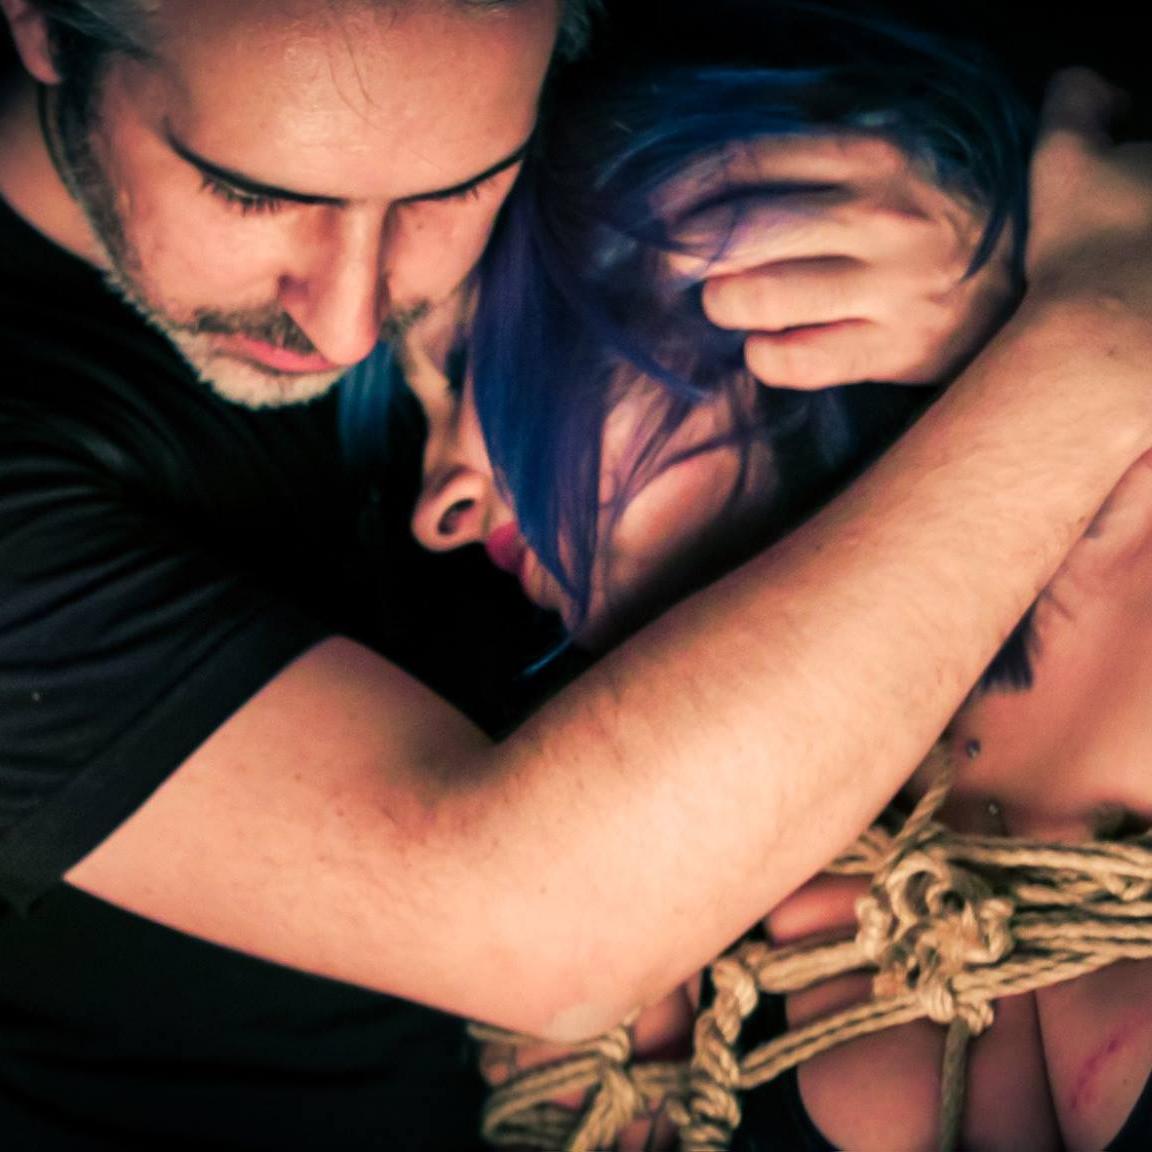 Zor Neurobashing - Madrid, SpainWorkshops // Tuition // SessionsPerformance // Artistic WorkPhotographyemail // website // fetlife // instaMadrid Shibariropework: Zor Neurobashingstill: Srta Dahimodelling: bondagedoll